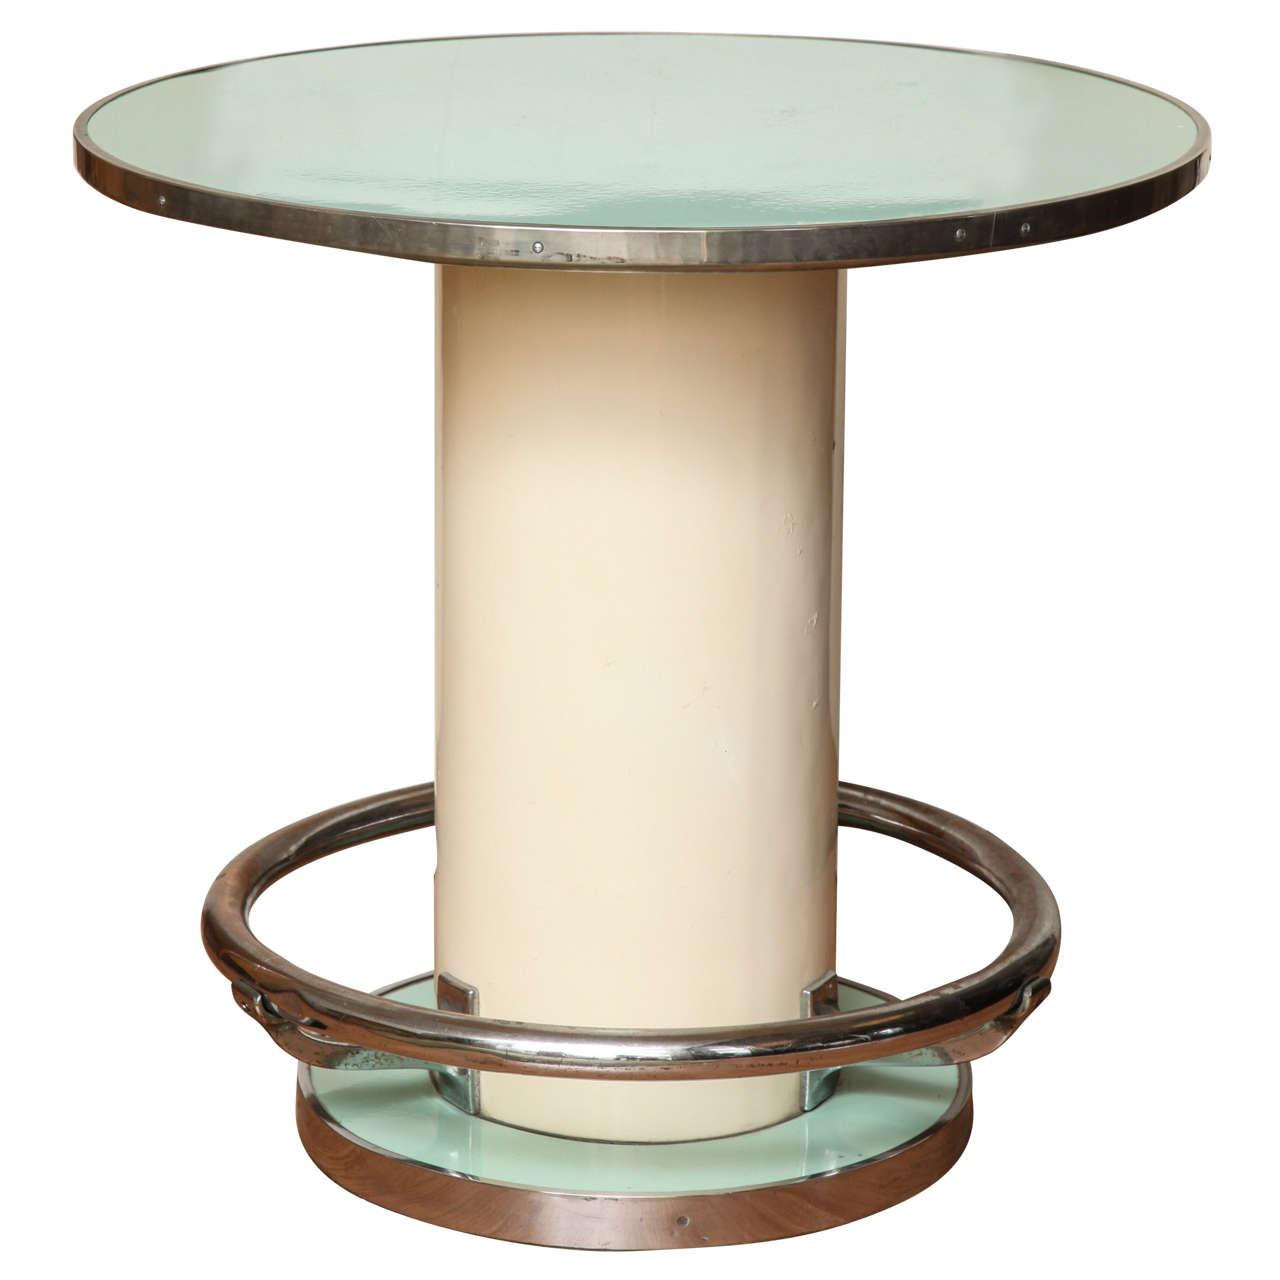 Maison Leleu Modernist Round Table